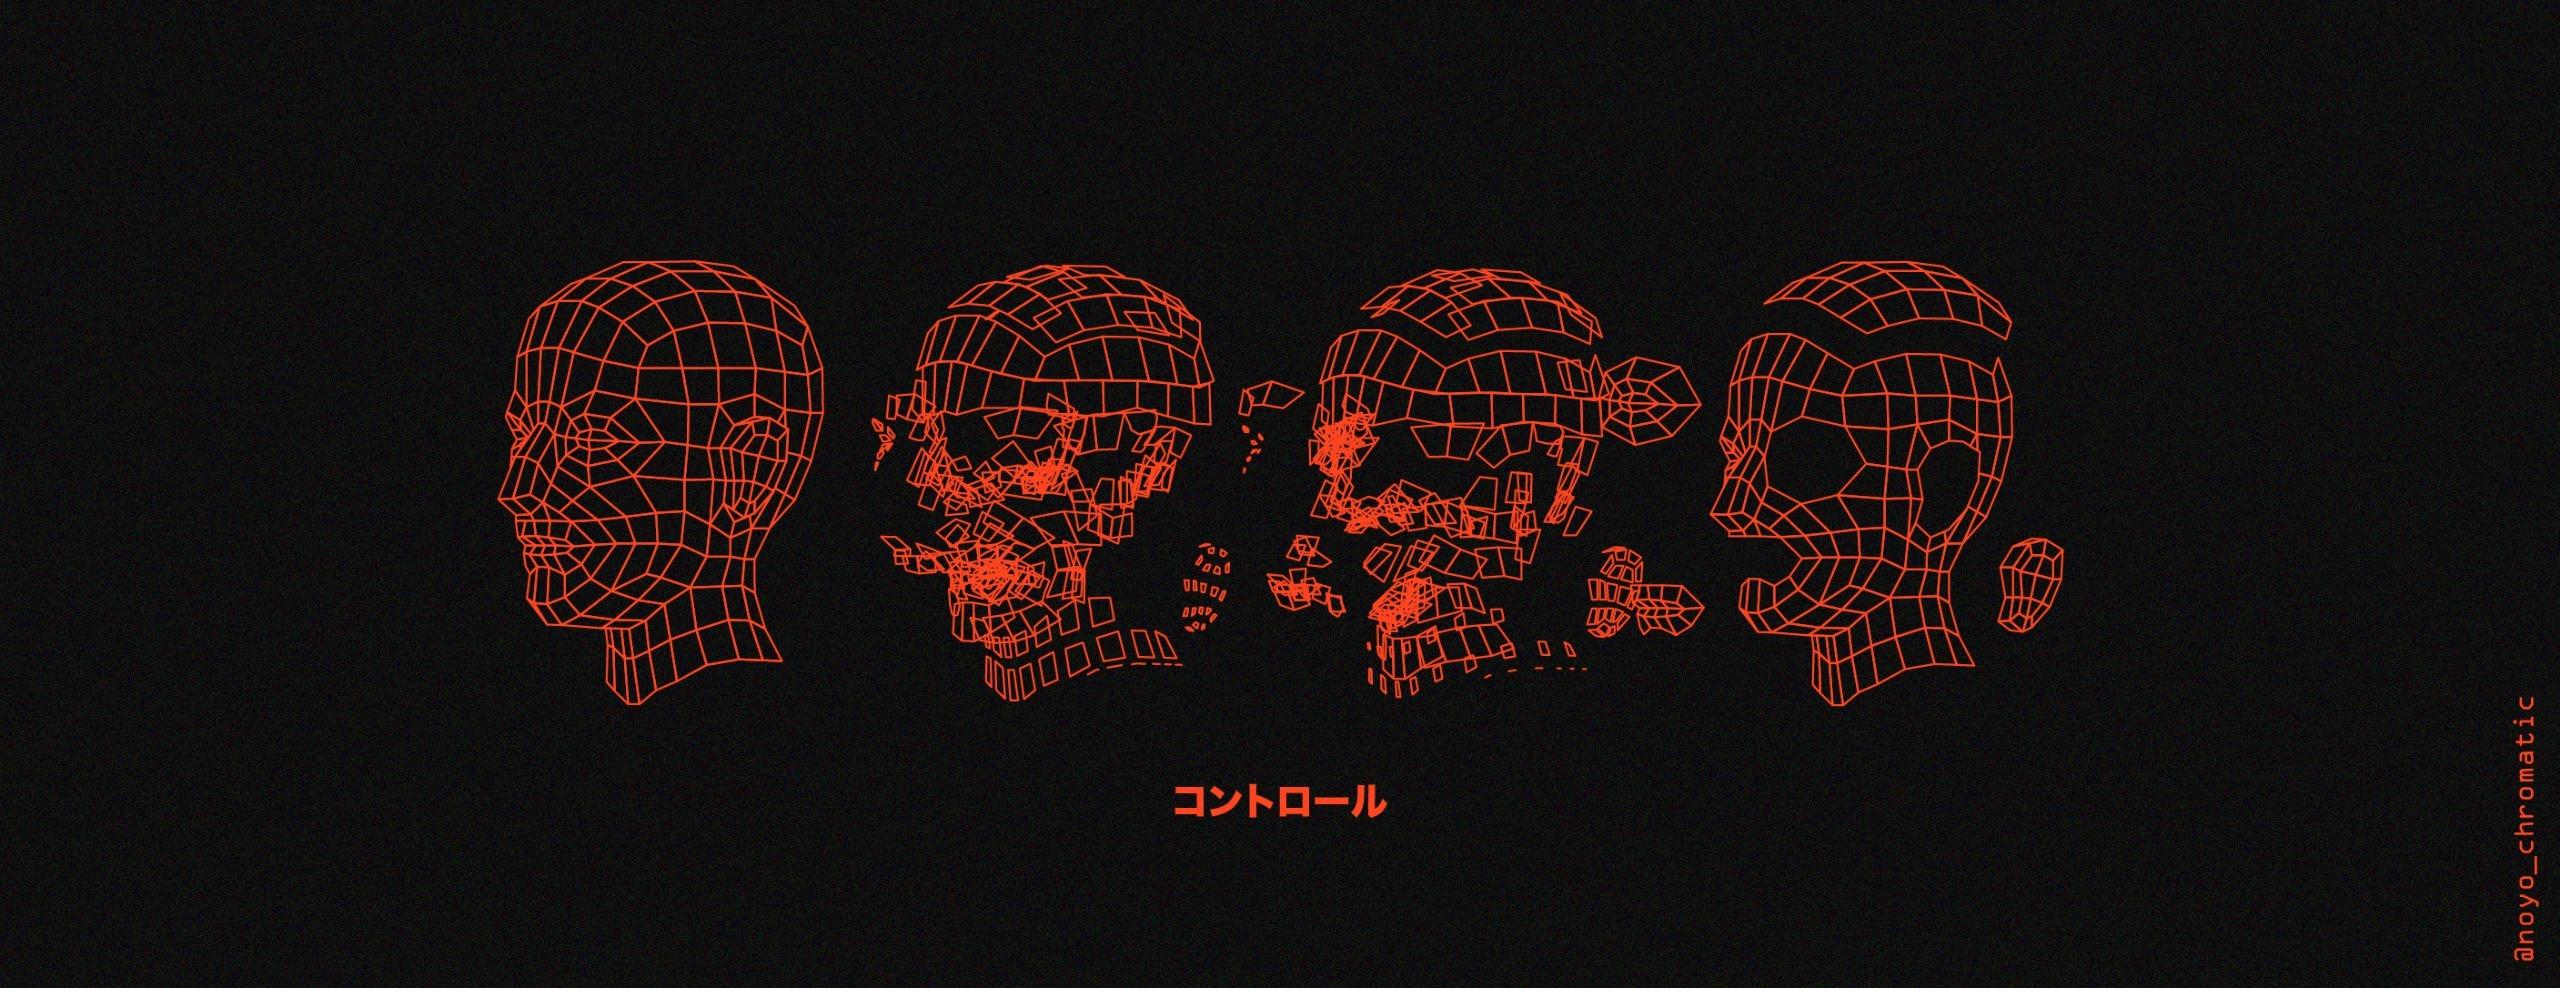 NOYO_CHROMATIC (@noyo_chromatic) Cover Image